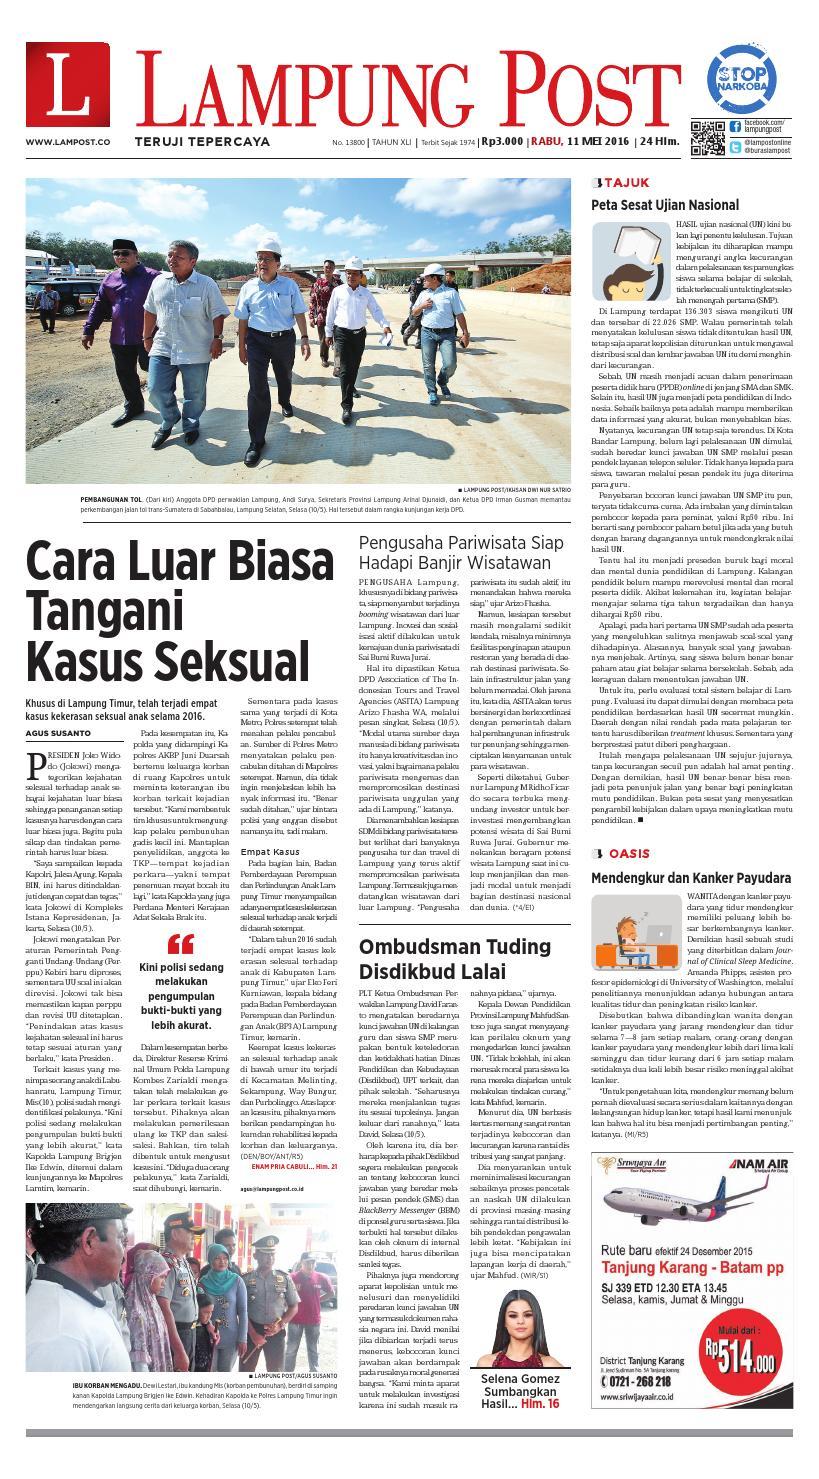 Lampung Post Rabu 11 Mei 2016 By Issuu Produk Ukm Bumn Sambal Bawang Goreng Maklin